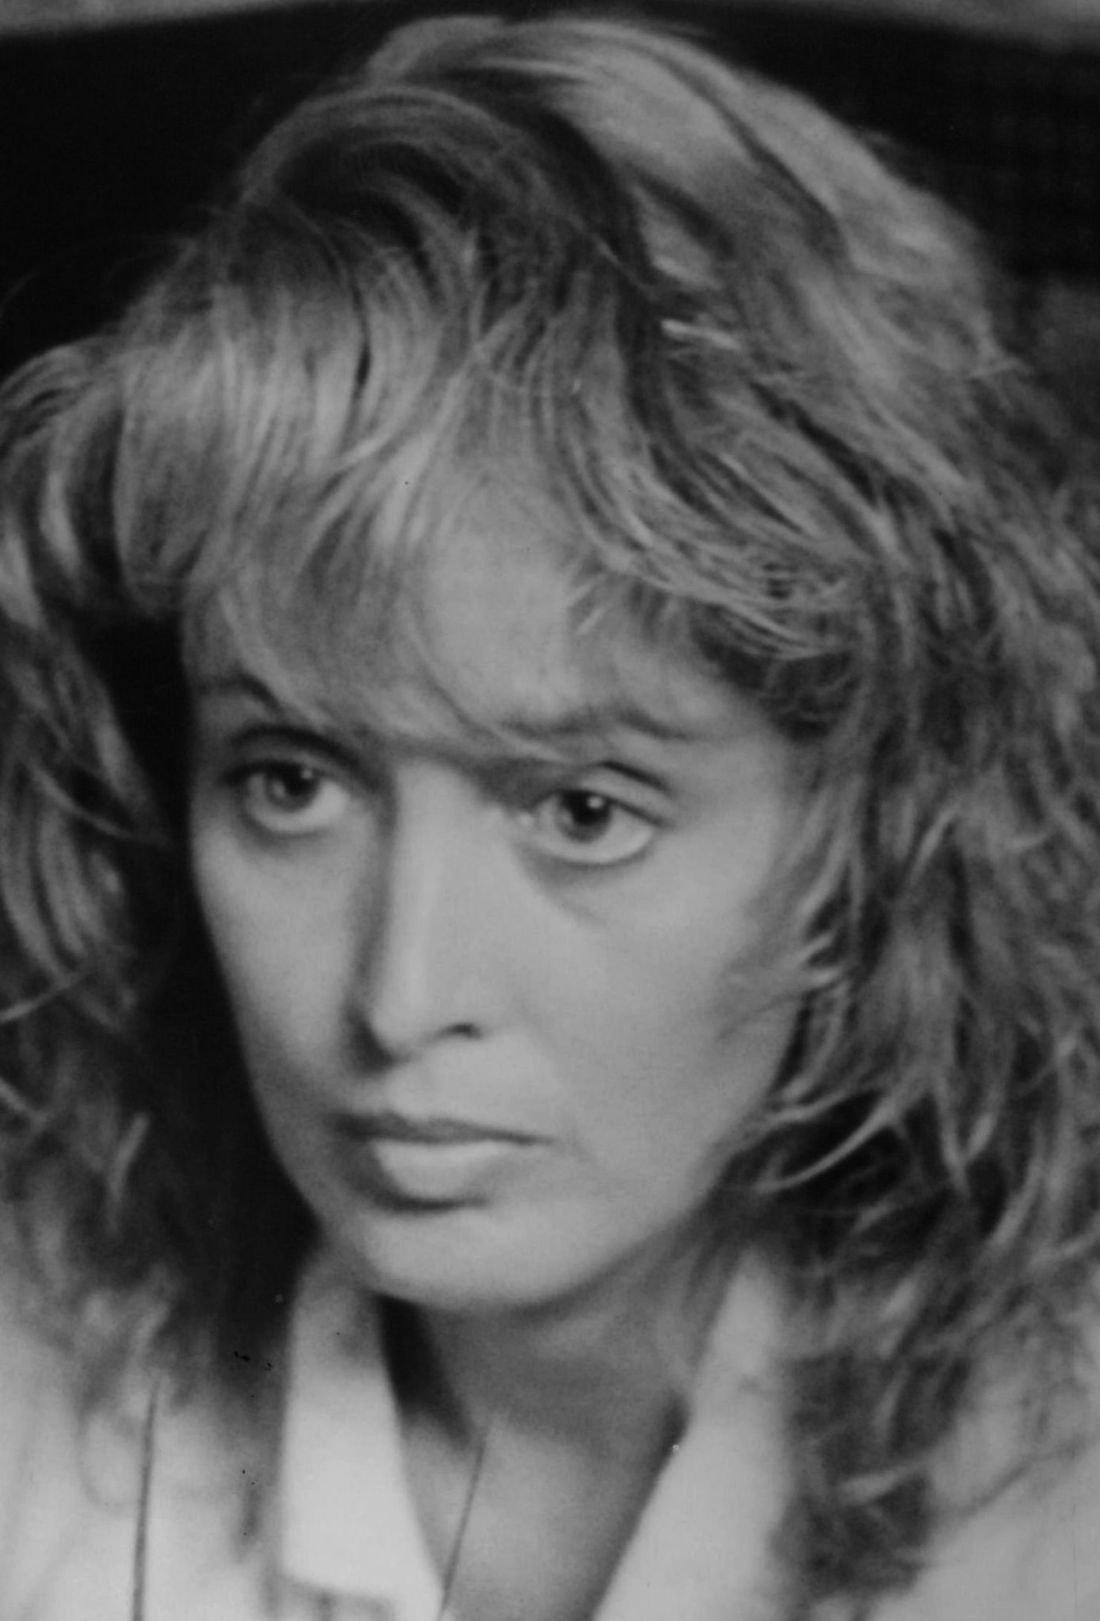 Ronee Blakley In 'A Nightmare On Elm Street'